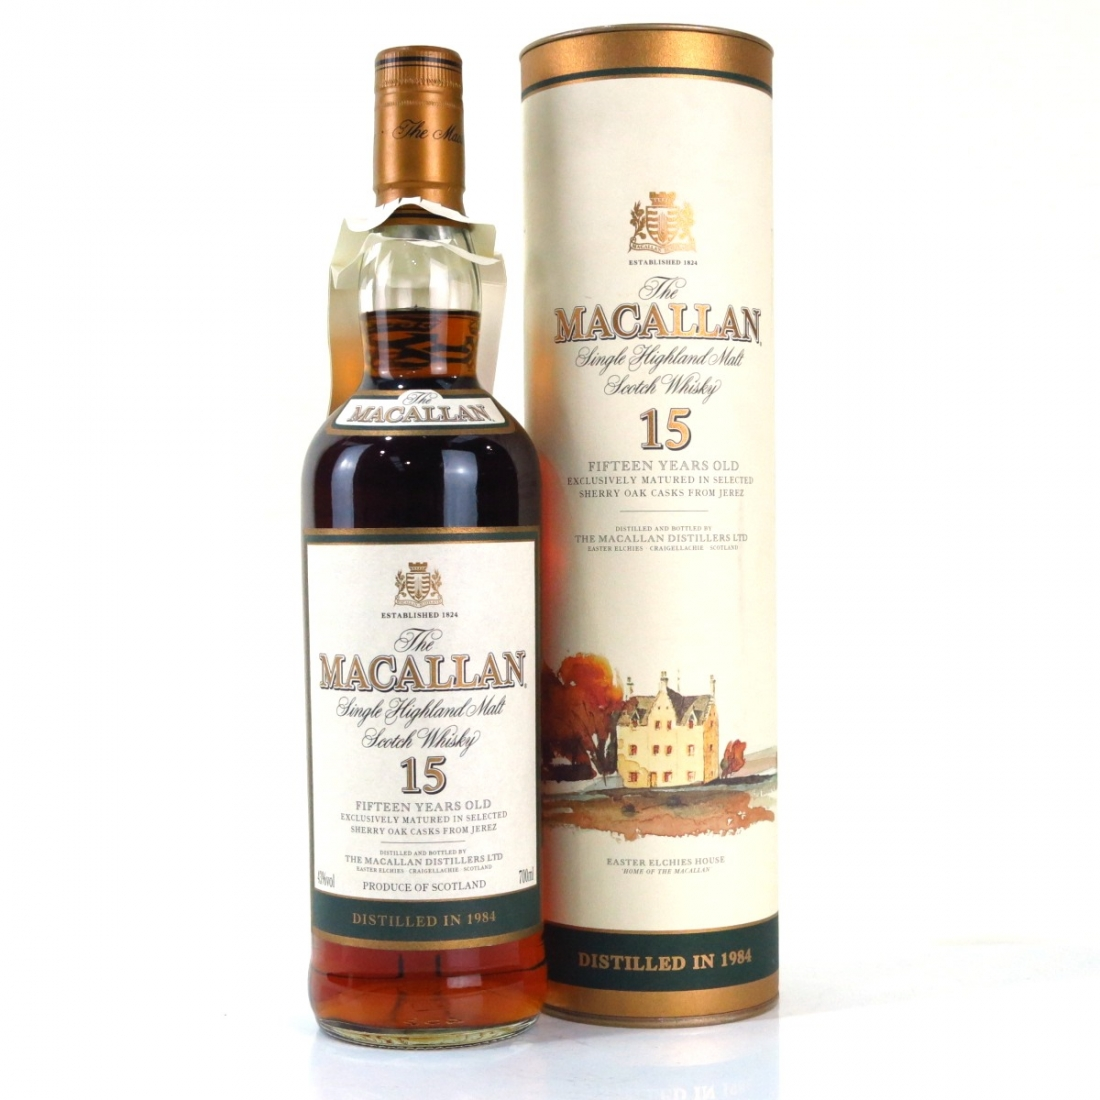 Macallan 15 Year Old 1984